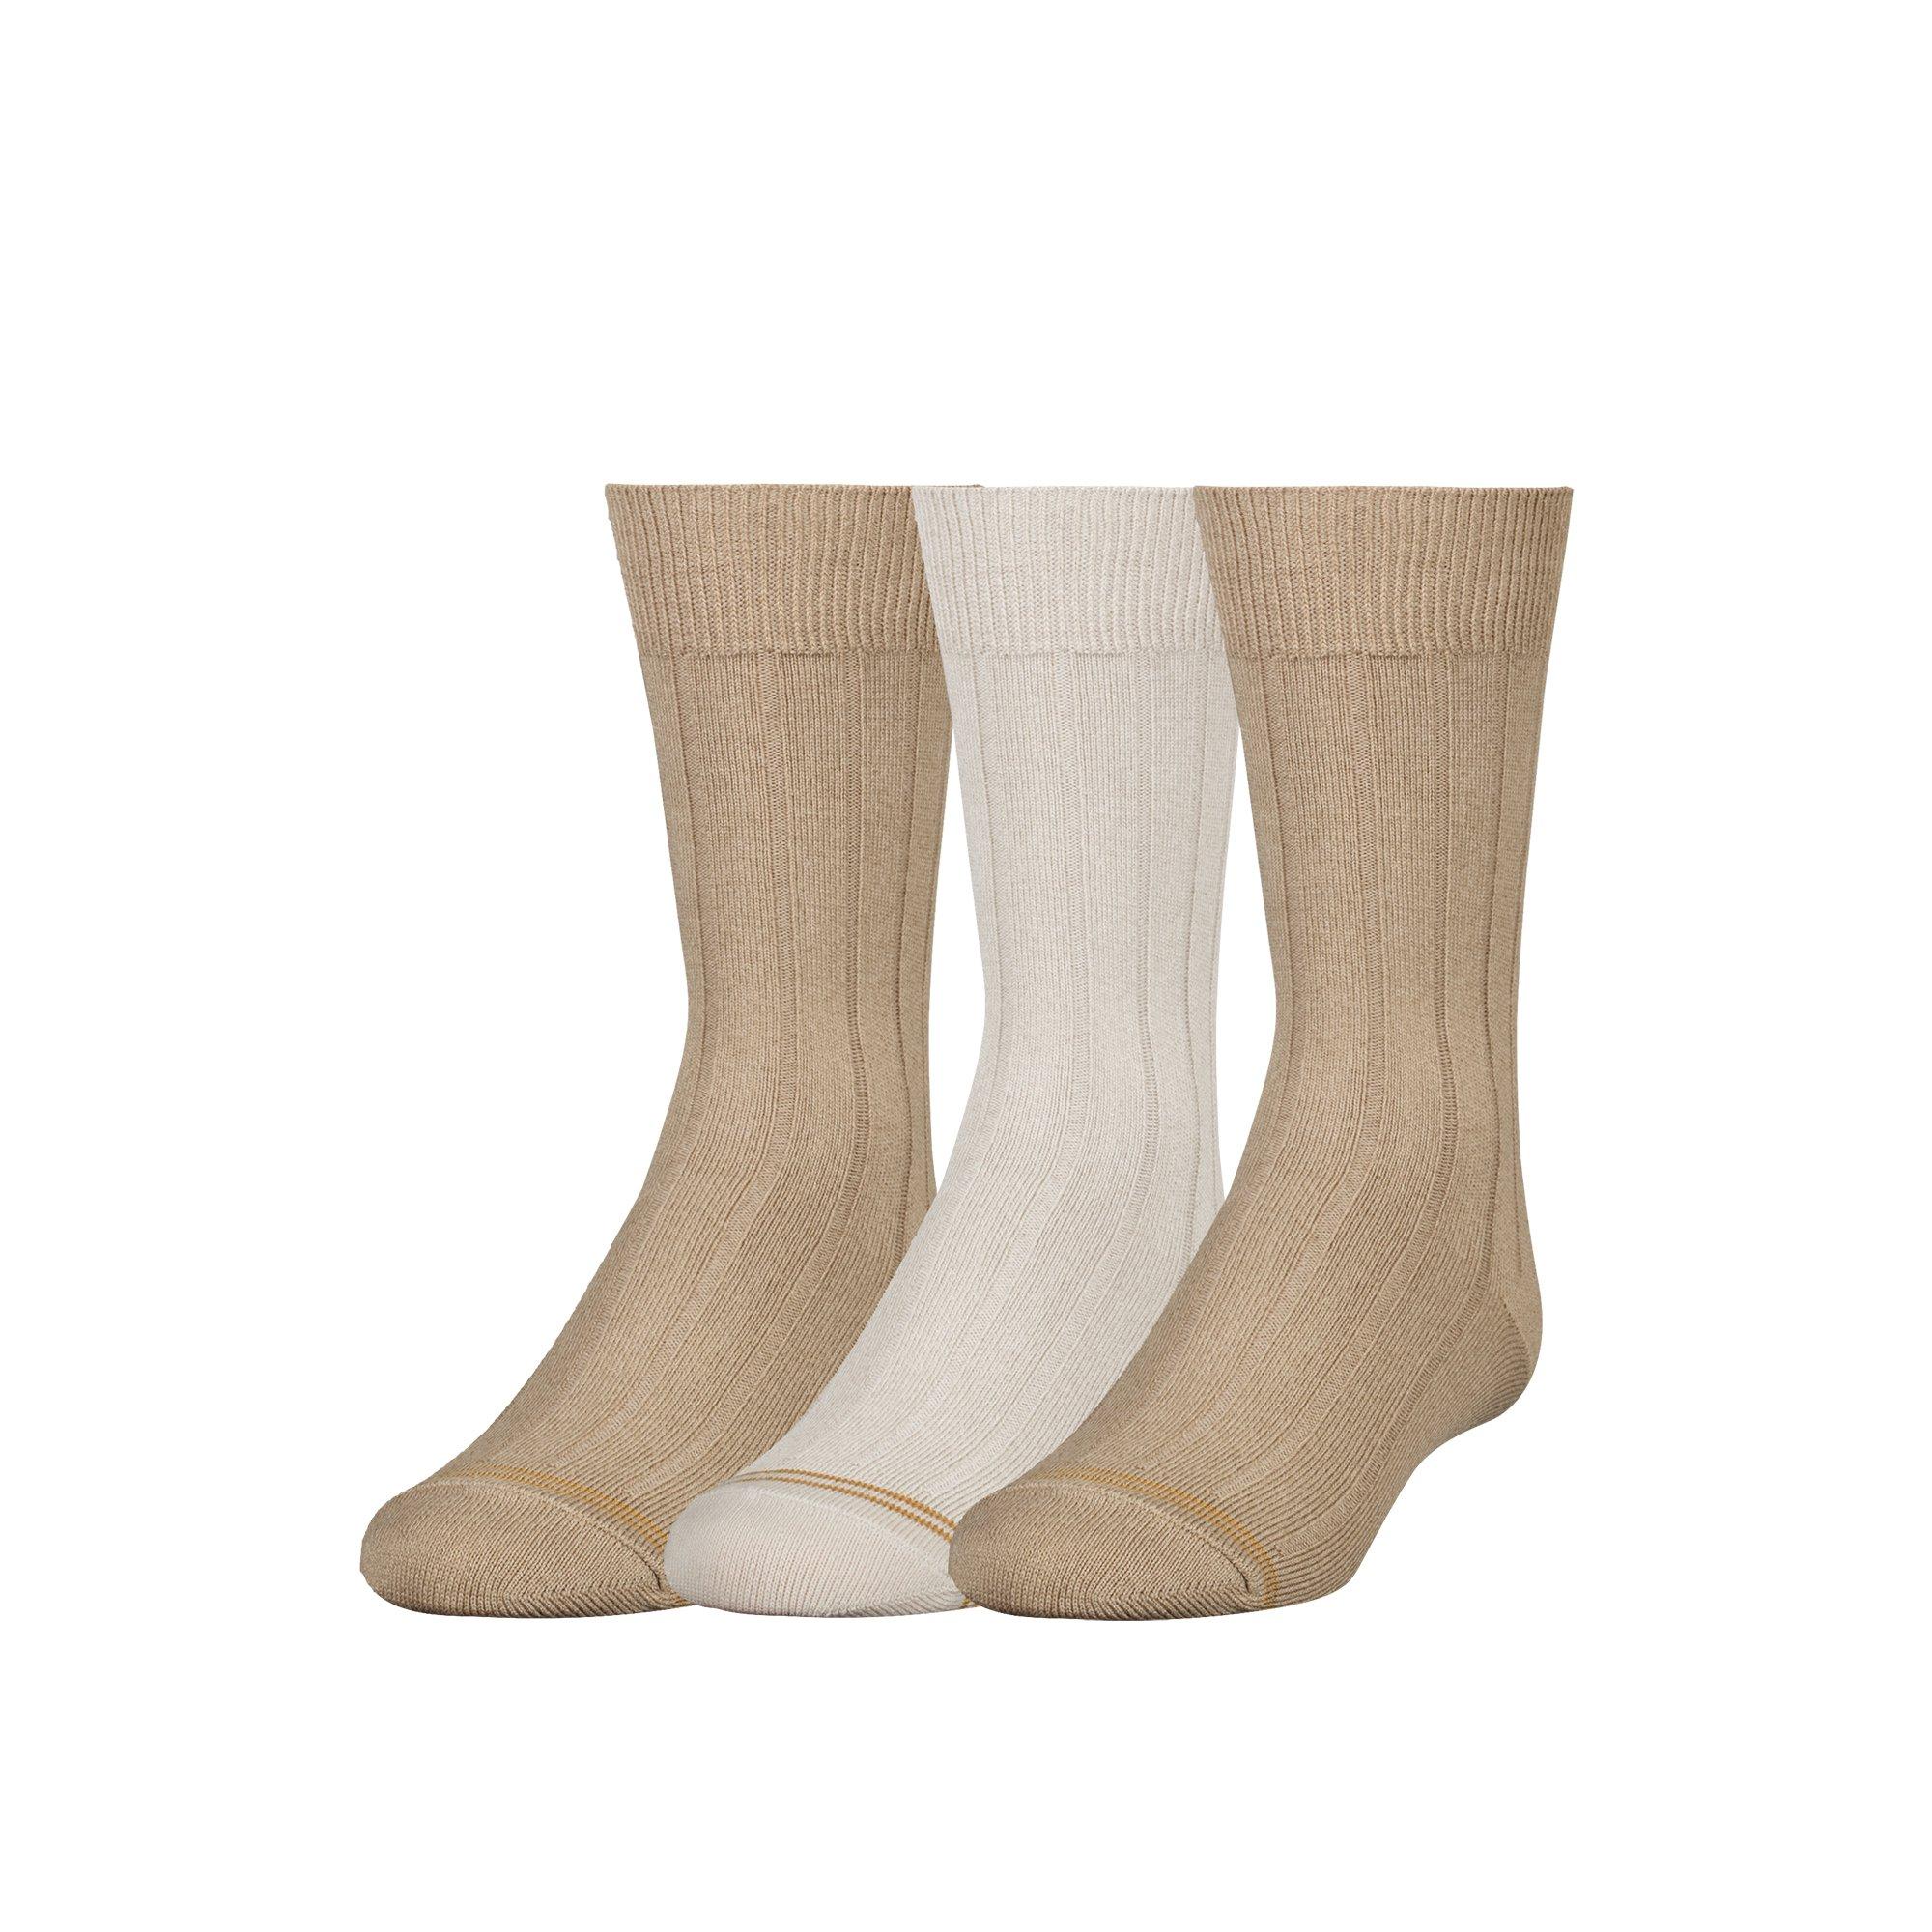 Gold Toe Boy's 8-20 Wide Rib Crew Socks (3 Pair), Khaki/Stone/Khaki, Large